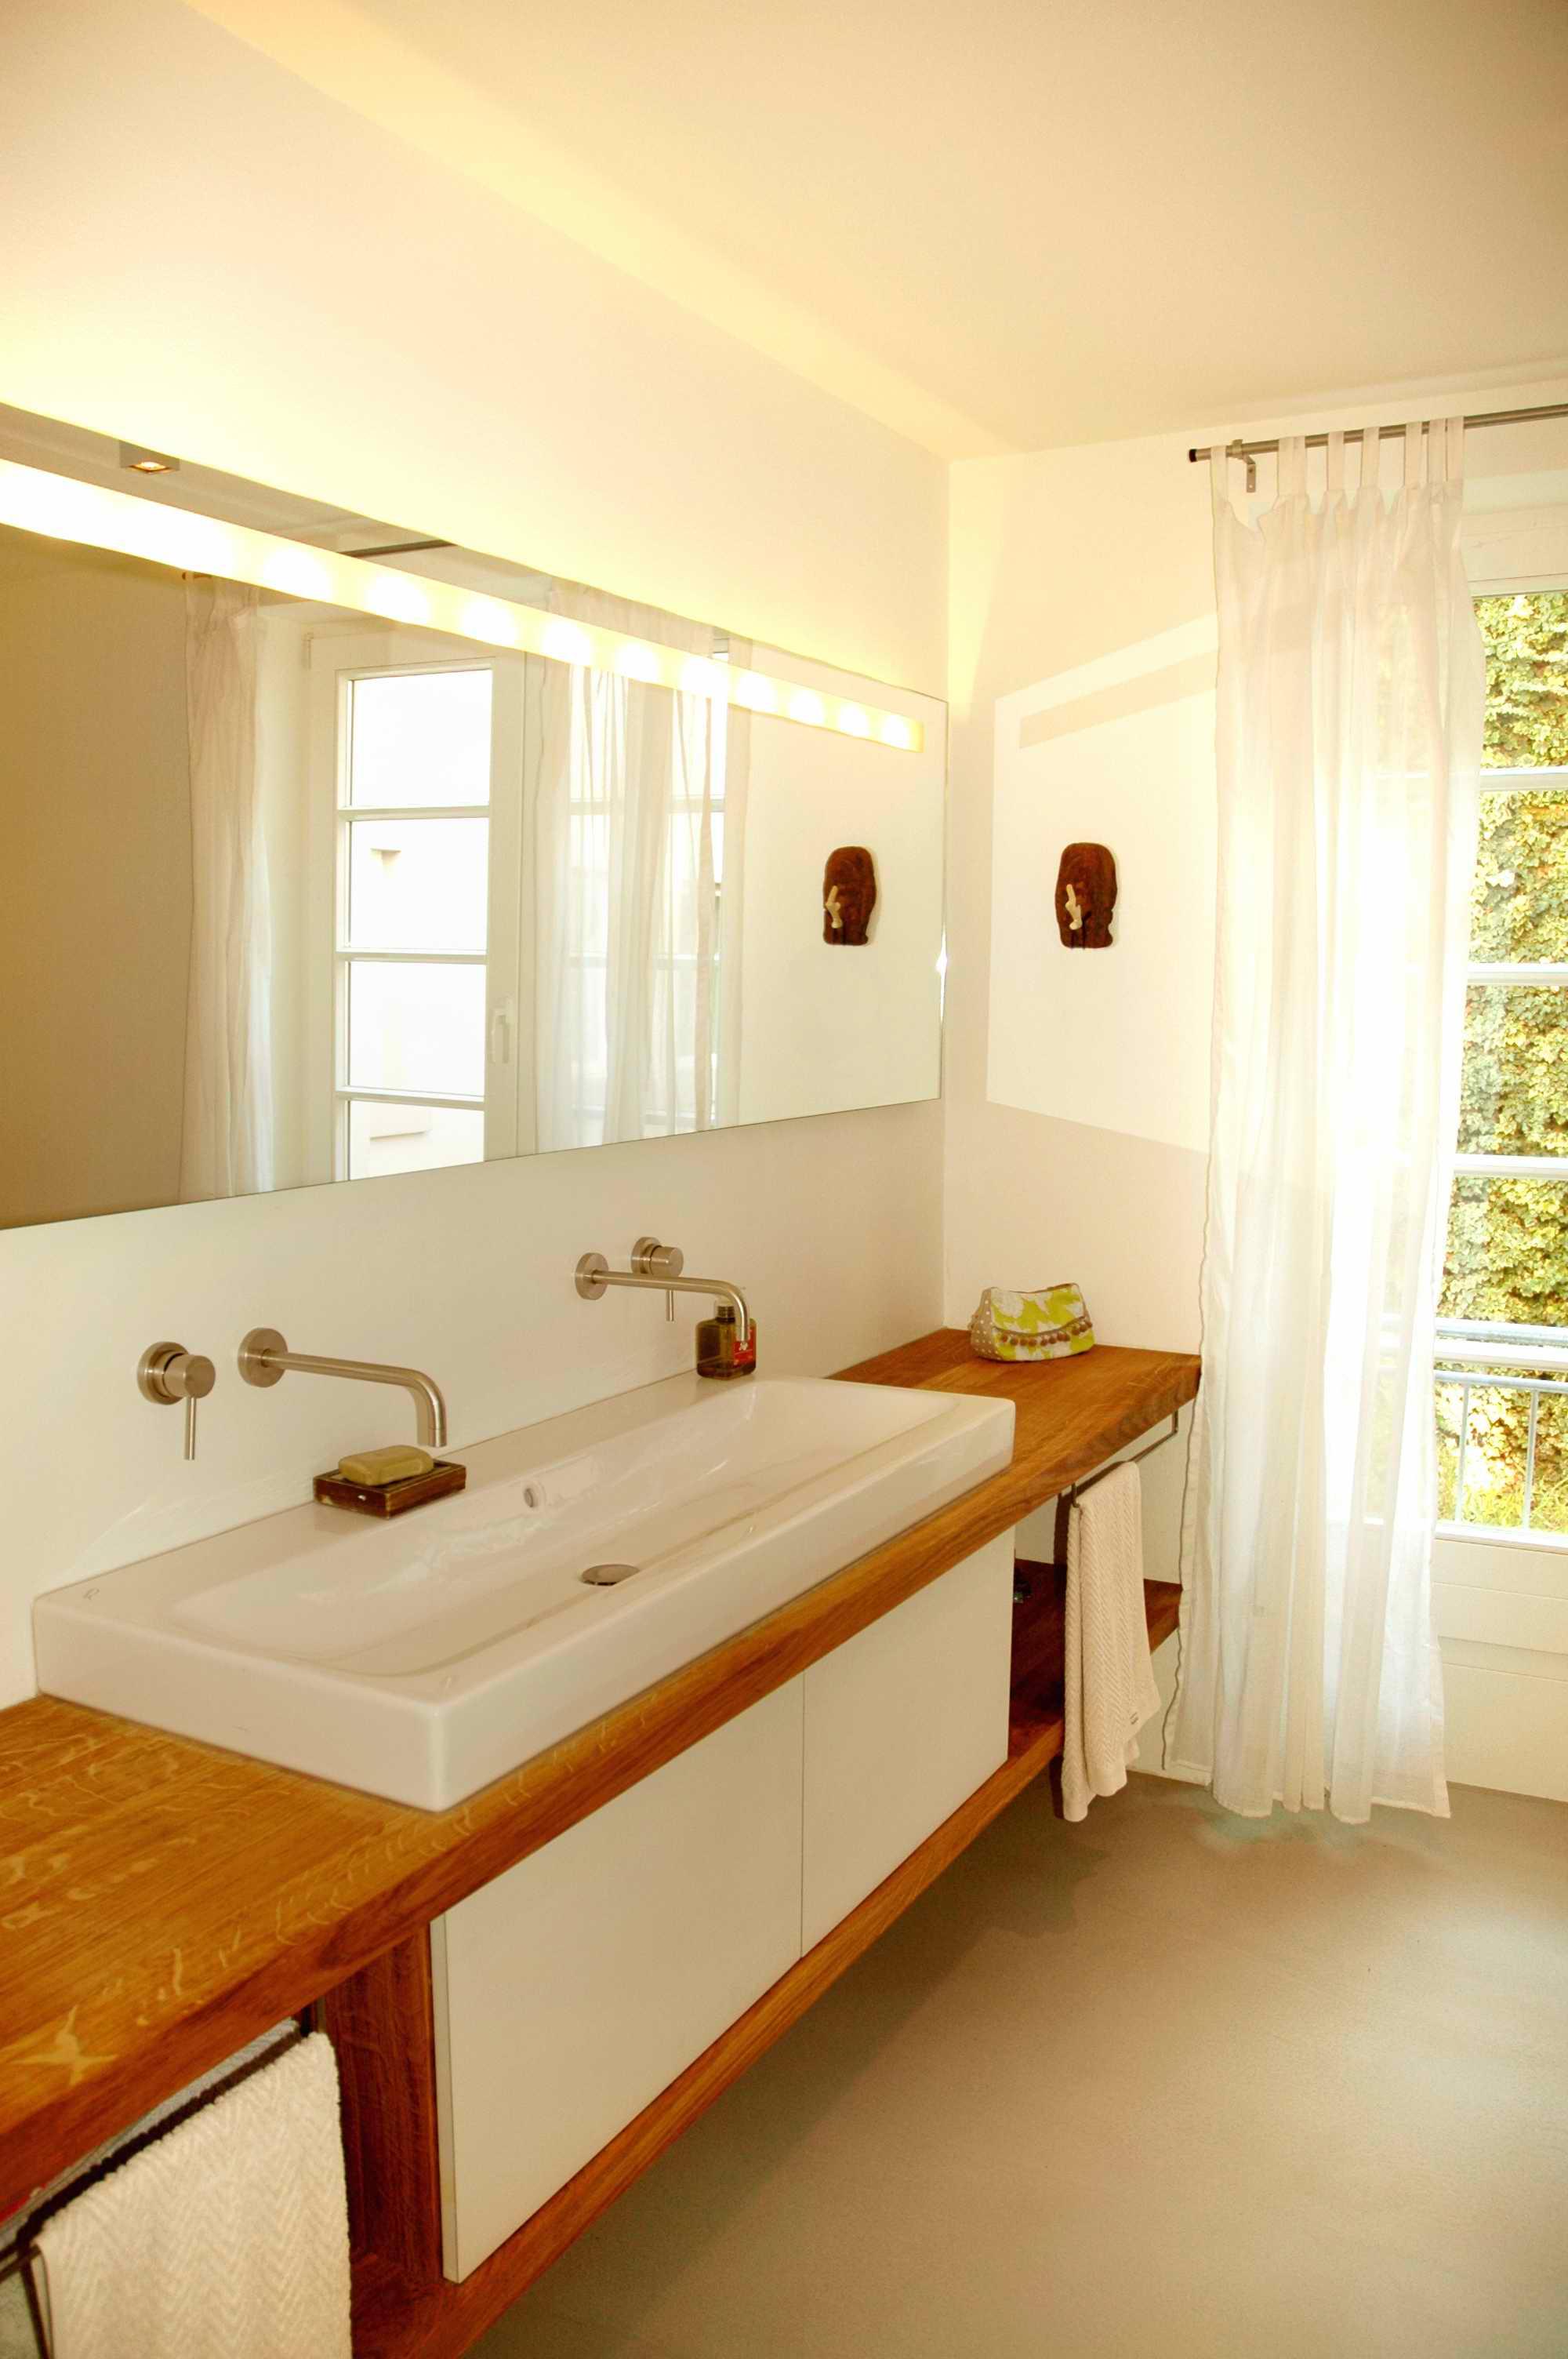 innenarchitekten wiesbaden innenarchitekten wiesbaden 23. Black Bedroom Furniture Sets. Home Design Ideas